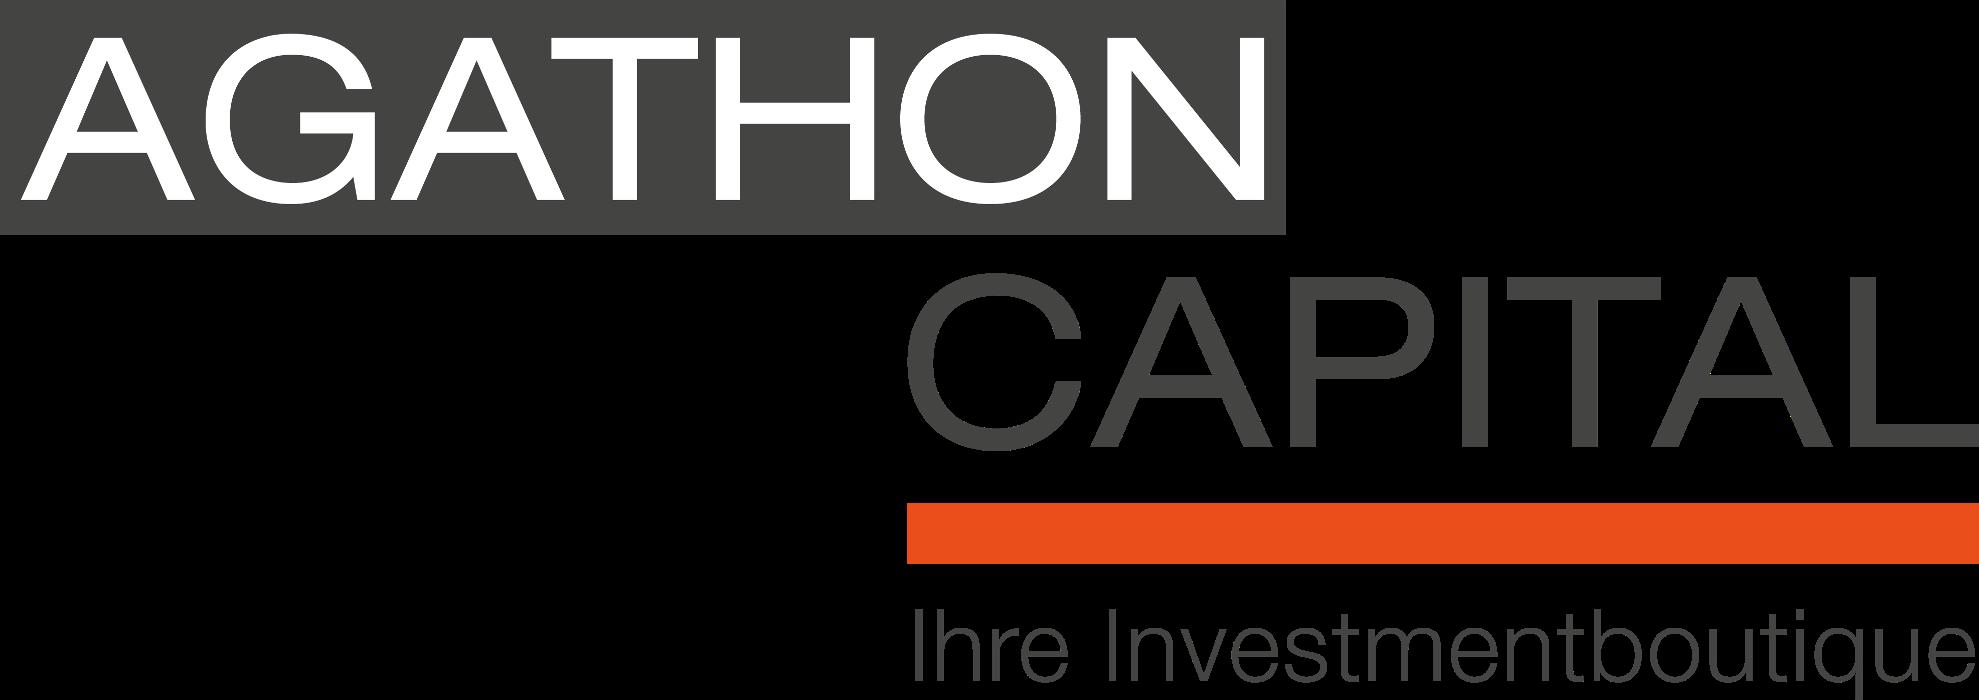 Bild zu Agathon Capital GmbH in Köln